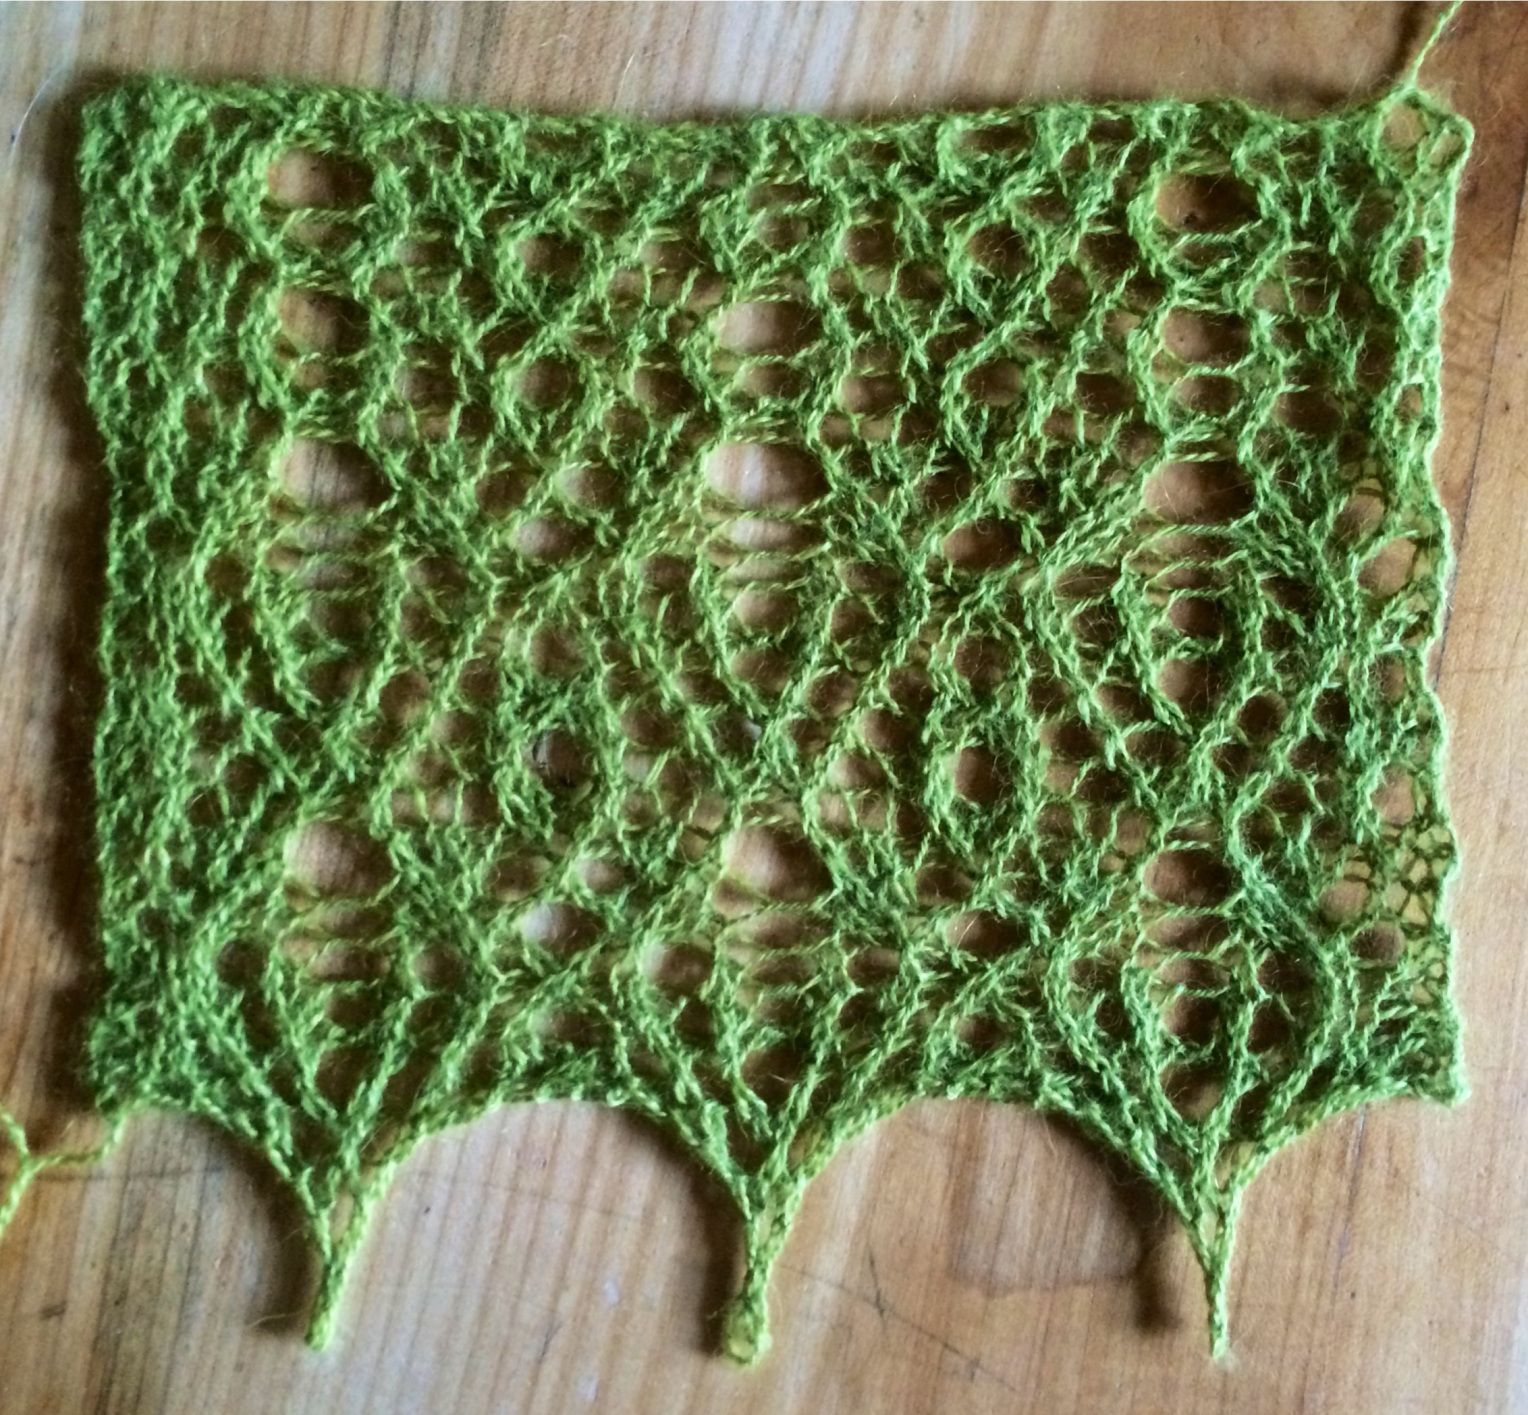 Wild/erness, a free lace knitting pattern.